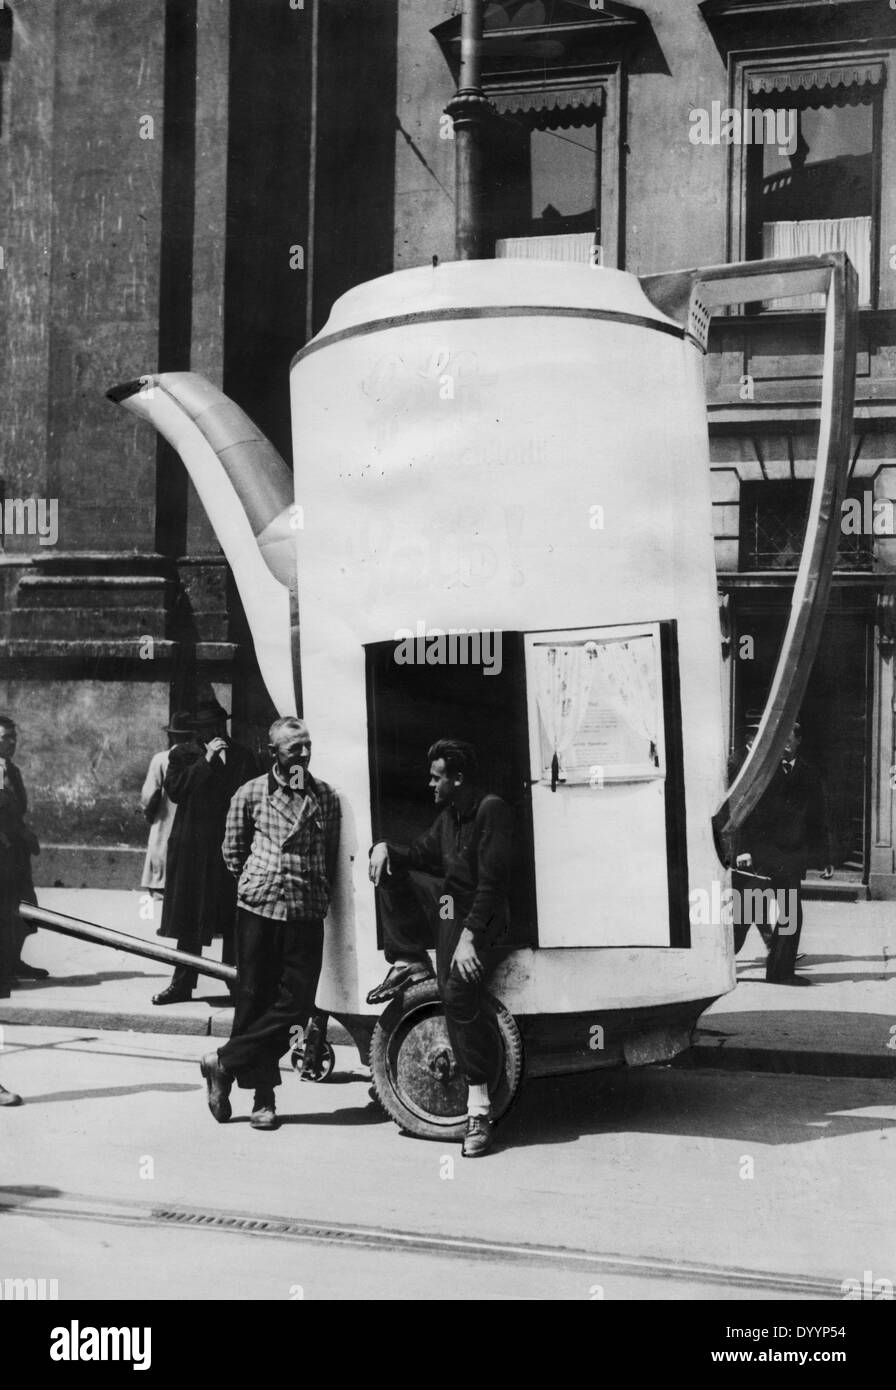 Economic Crisis Of 1929 Black and White Stock Photos & Images - Alamy